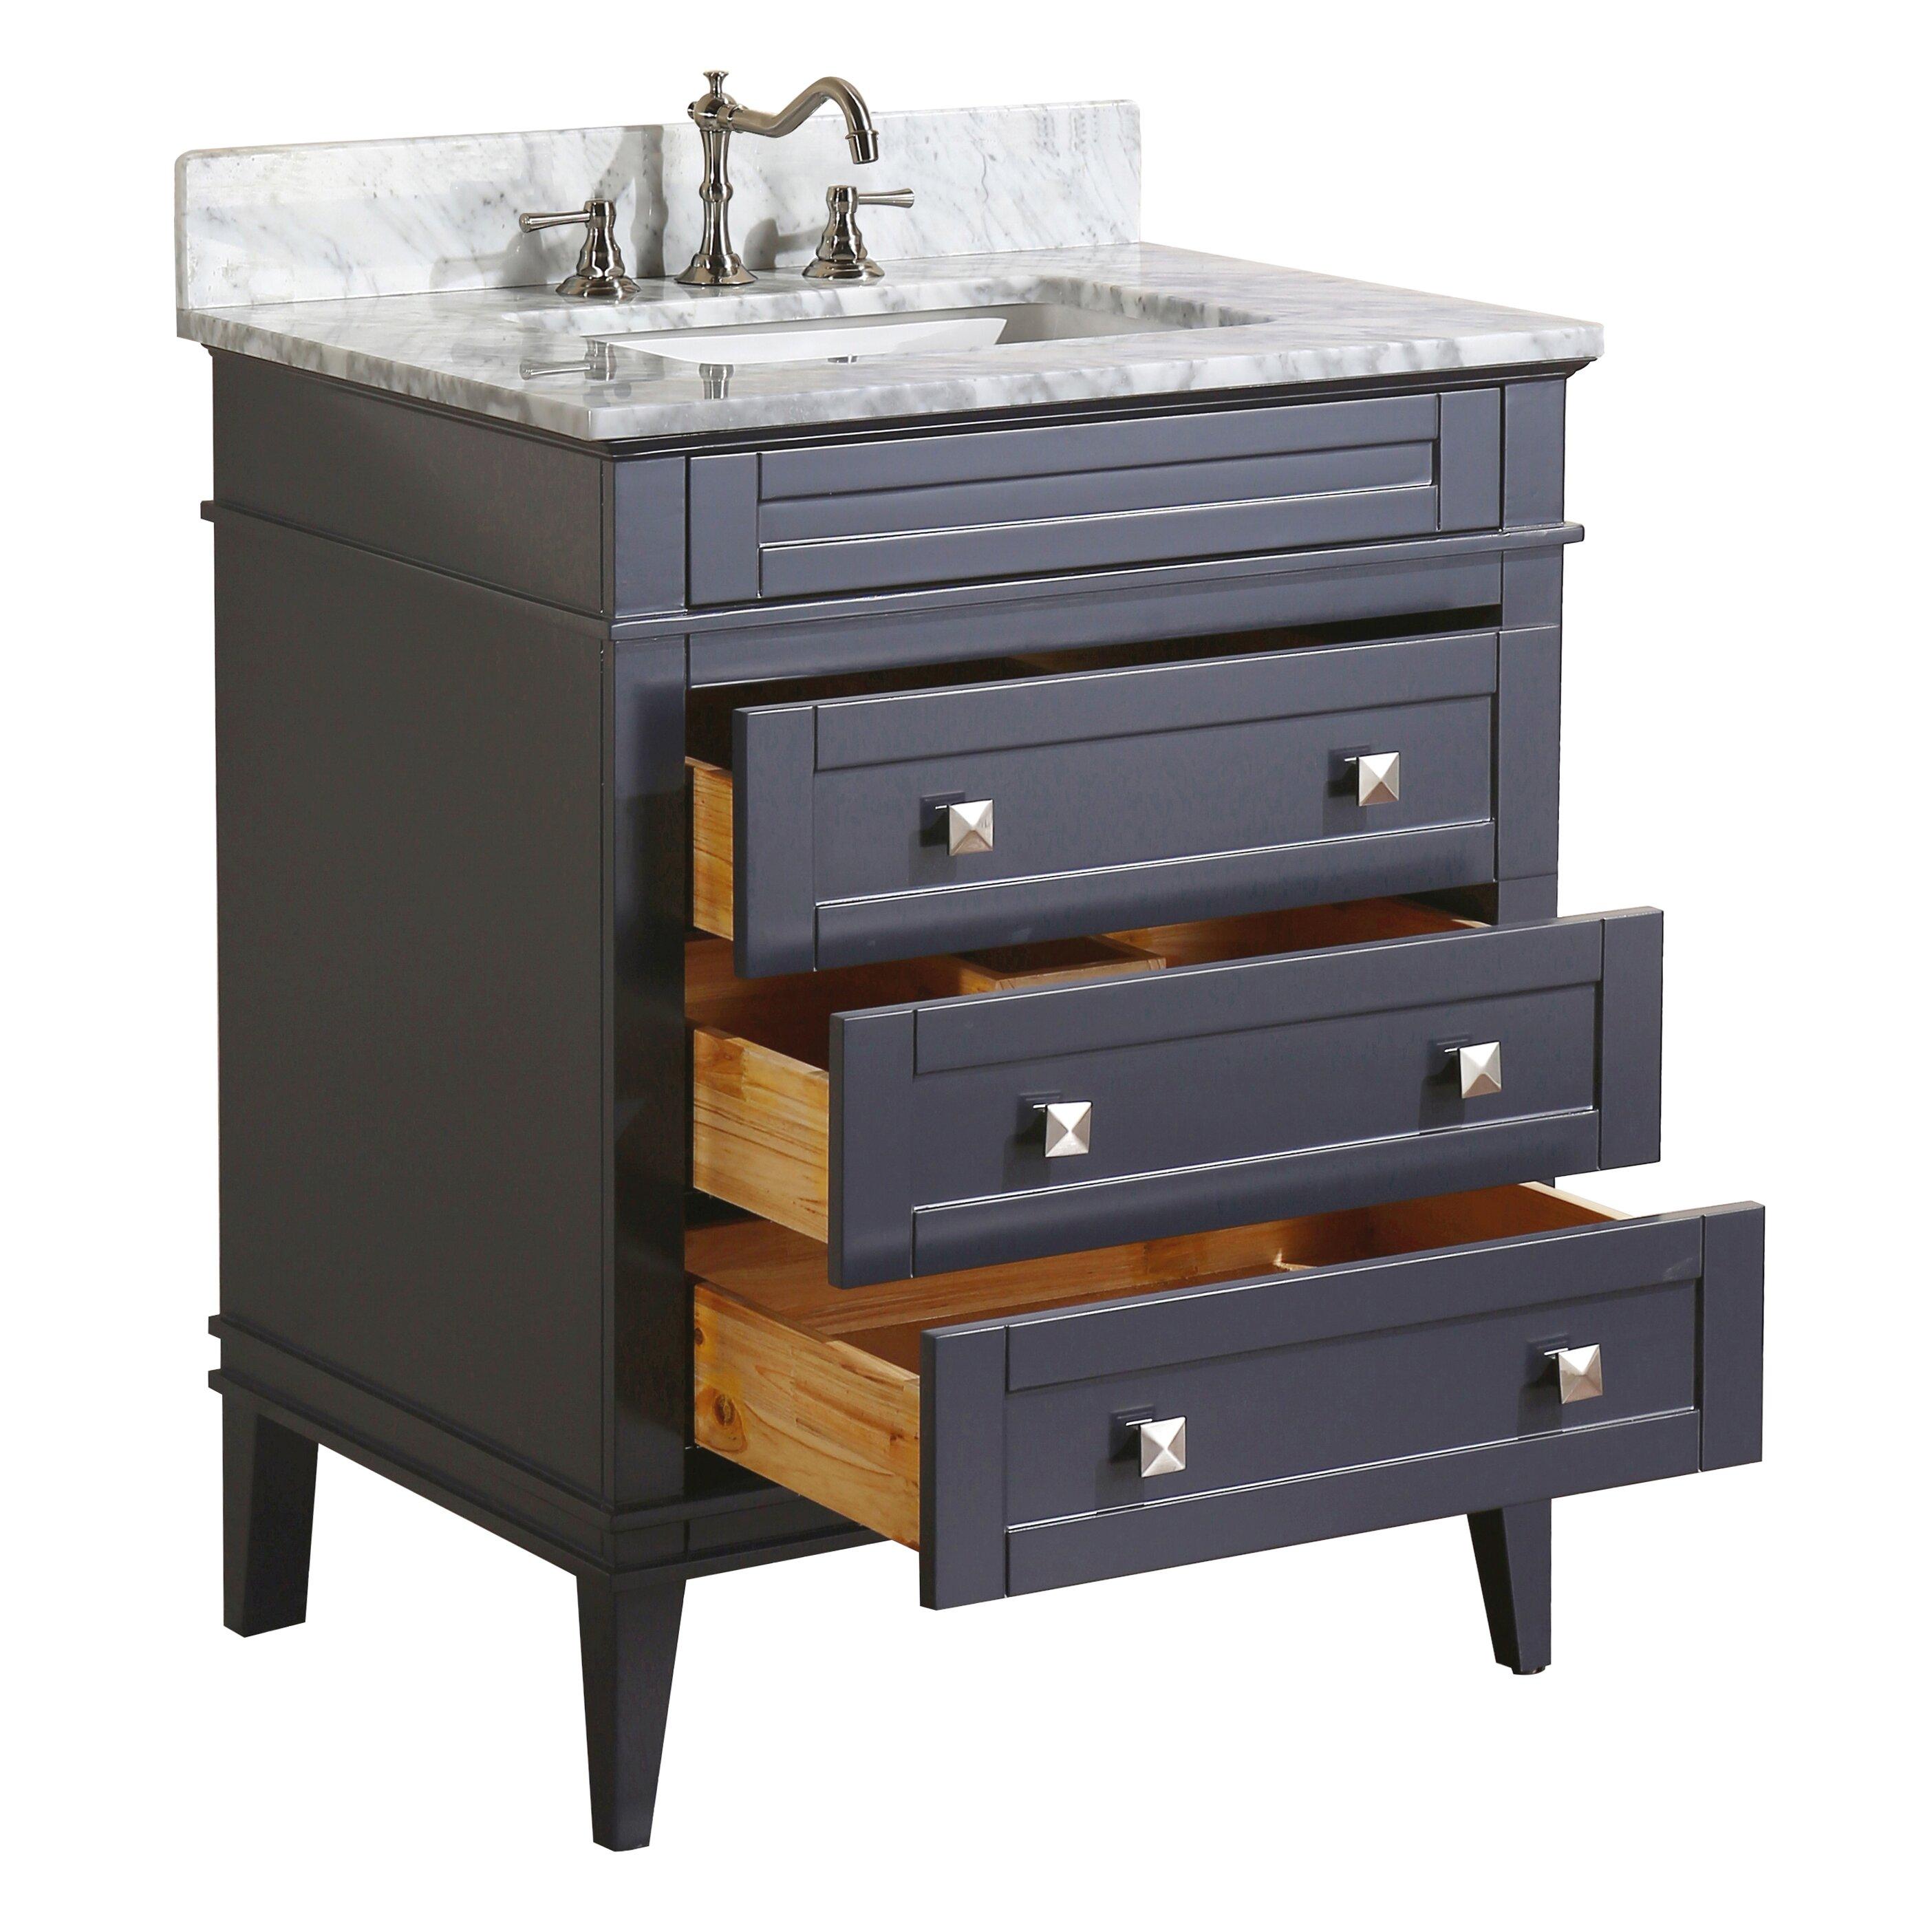 Kitchen Bath Collection Eleanor 30 Single Bathroom Vanity Set middot  Bathroom fixtures seattle  Bathroom Faucets. Tiles For Bathroom Walls Ideas